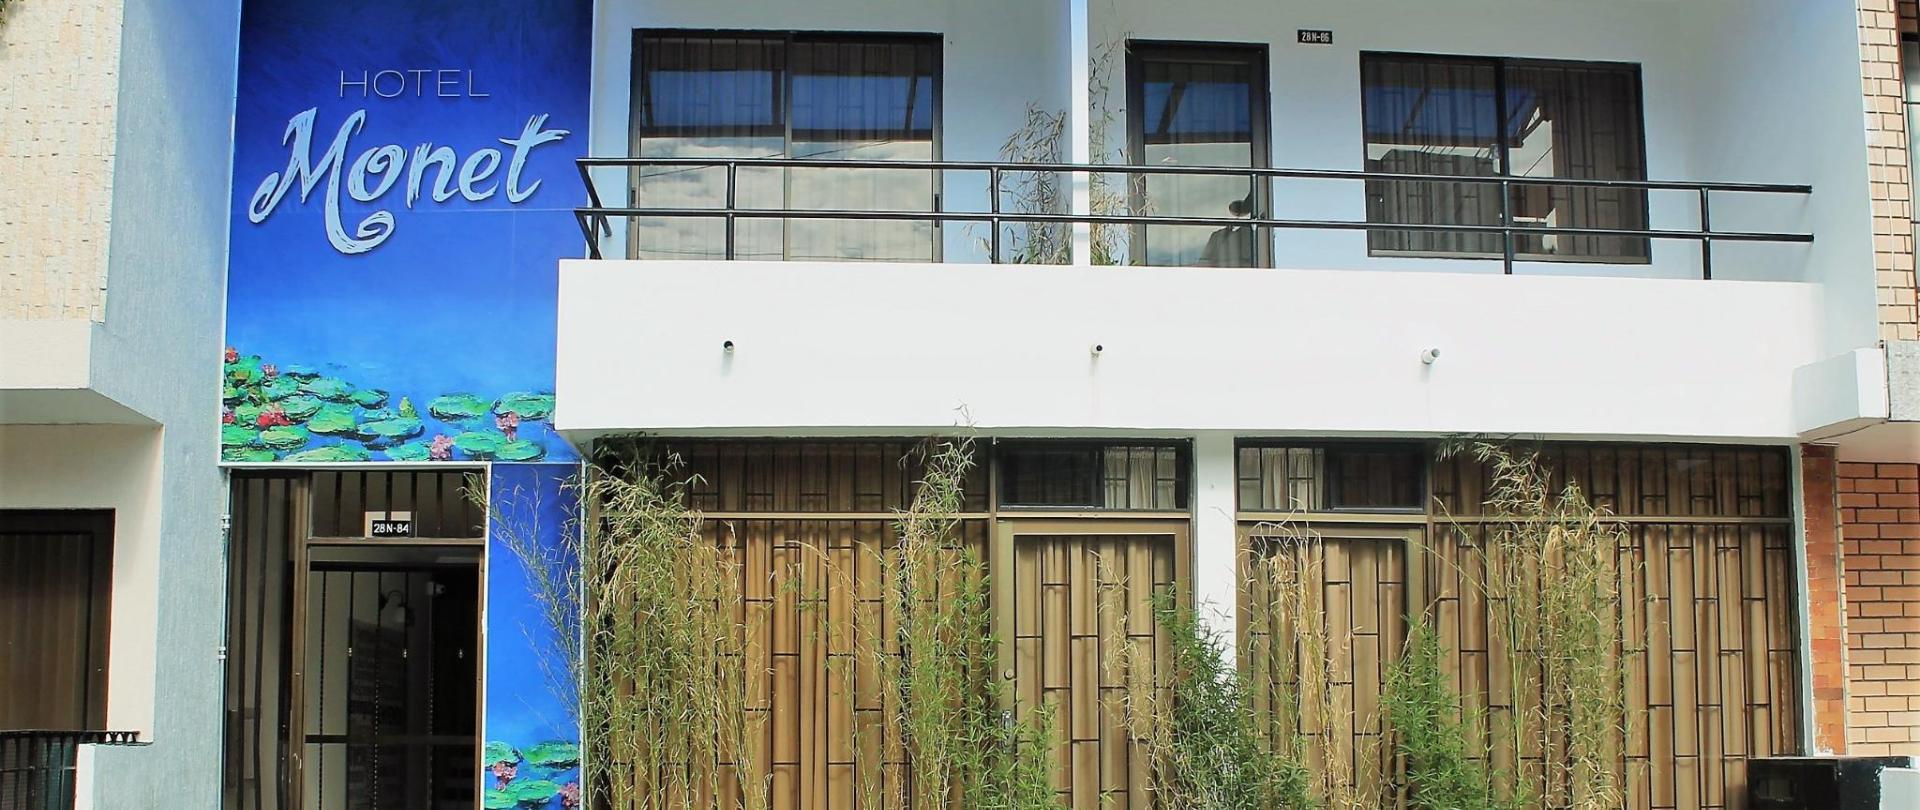 Imagen principal fachada.JPG